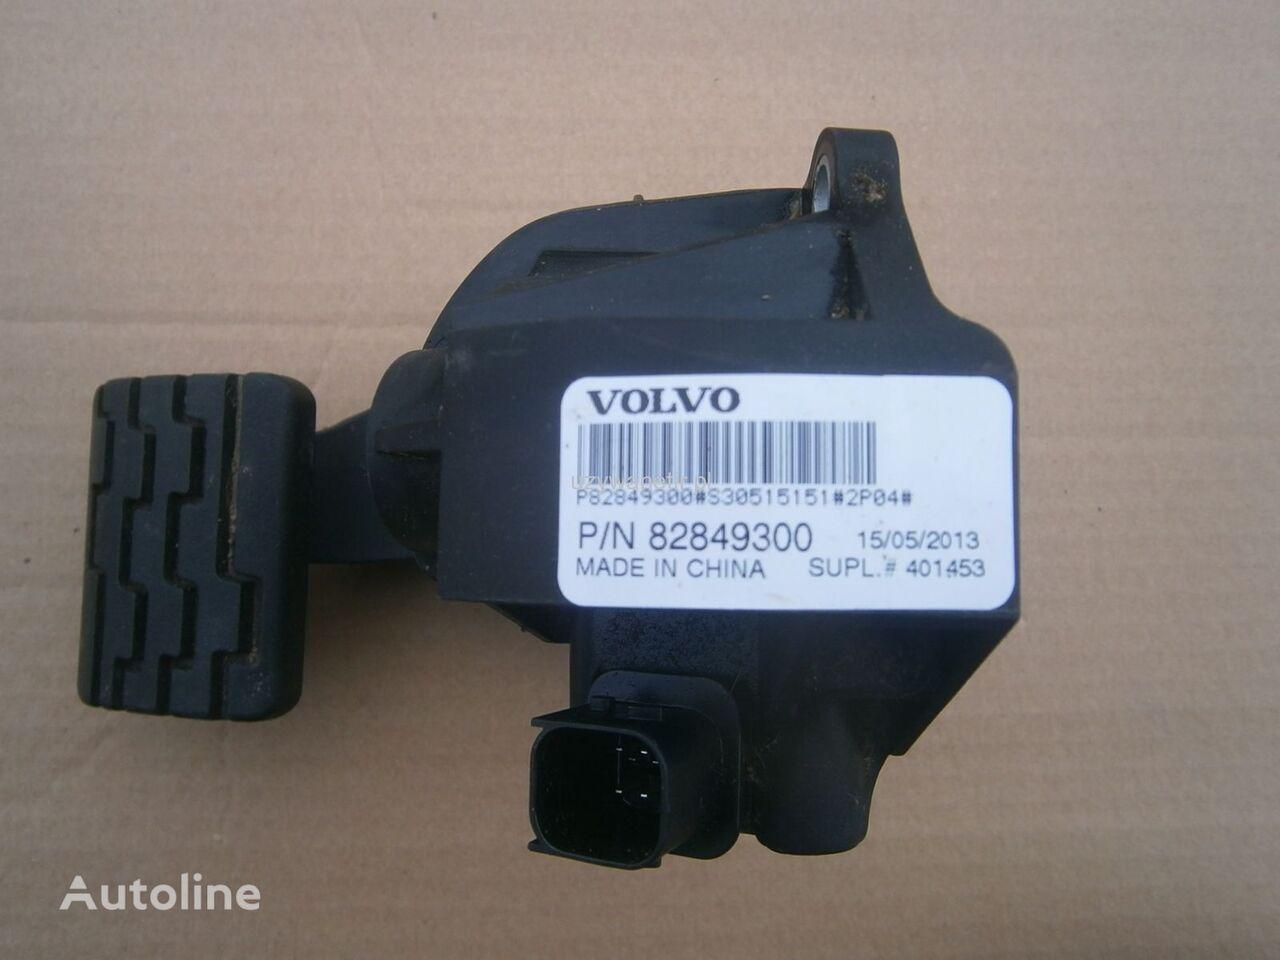 педаль акселератора VOLVO FH4 EURO6 ACC control unit, accelerator pedal, engine control, 8 для тягача VOLVO FH4 EURO6